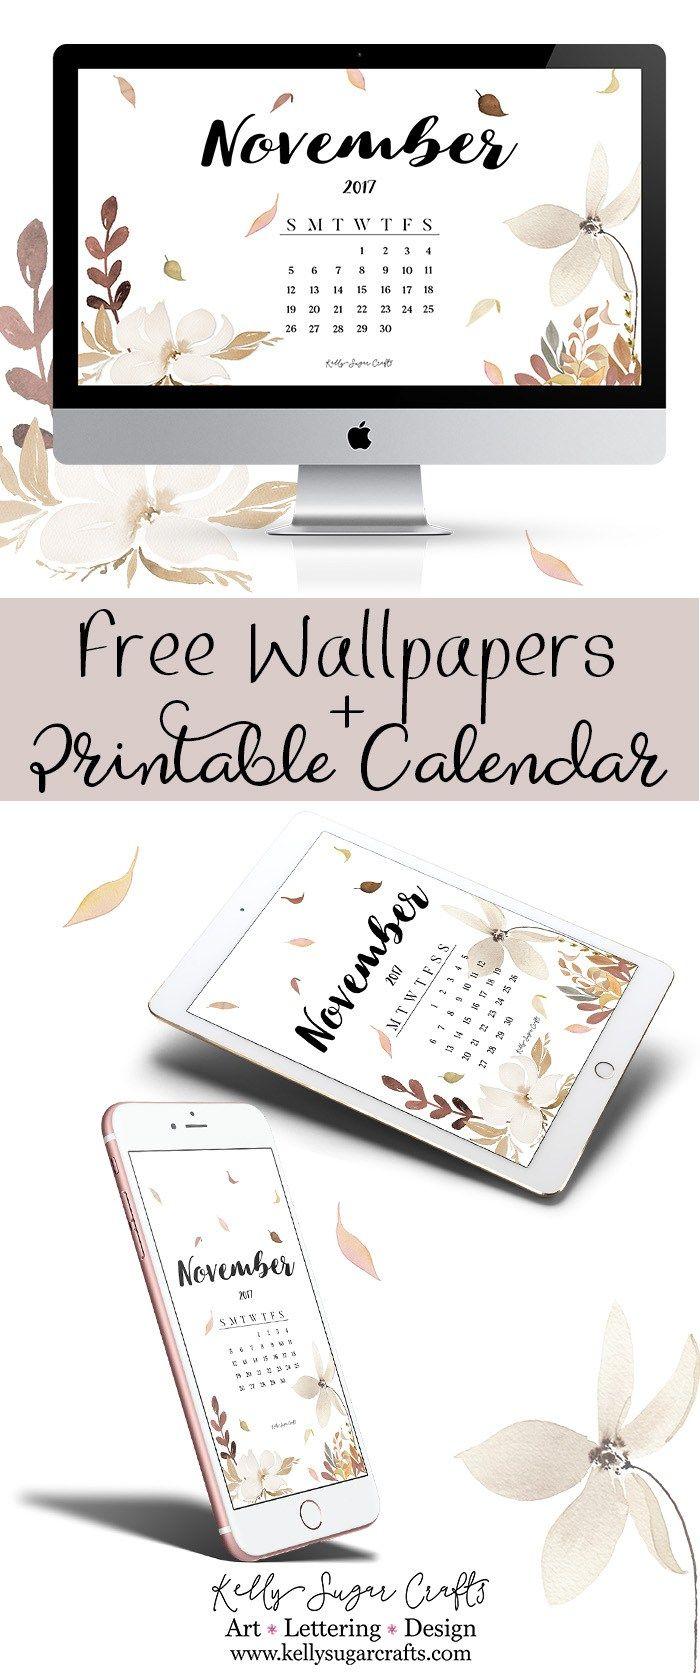 Wedding decorations white november 2018 November  Calendar Wallpapers and Free Printable by Kelly Sugar